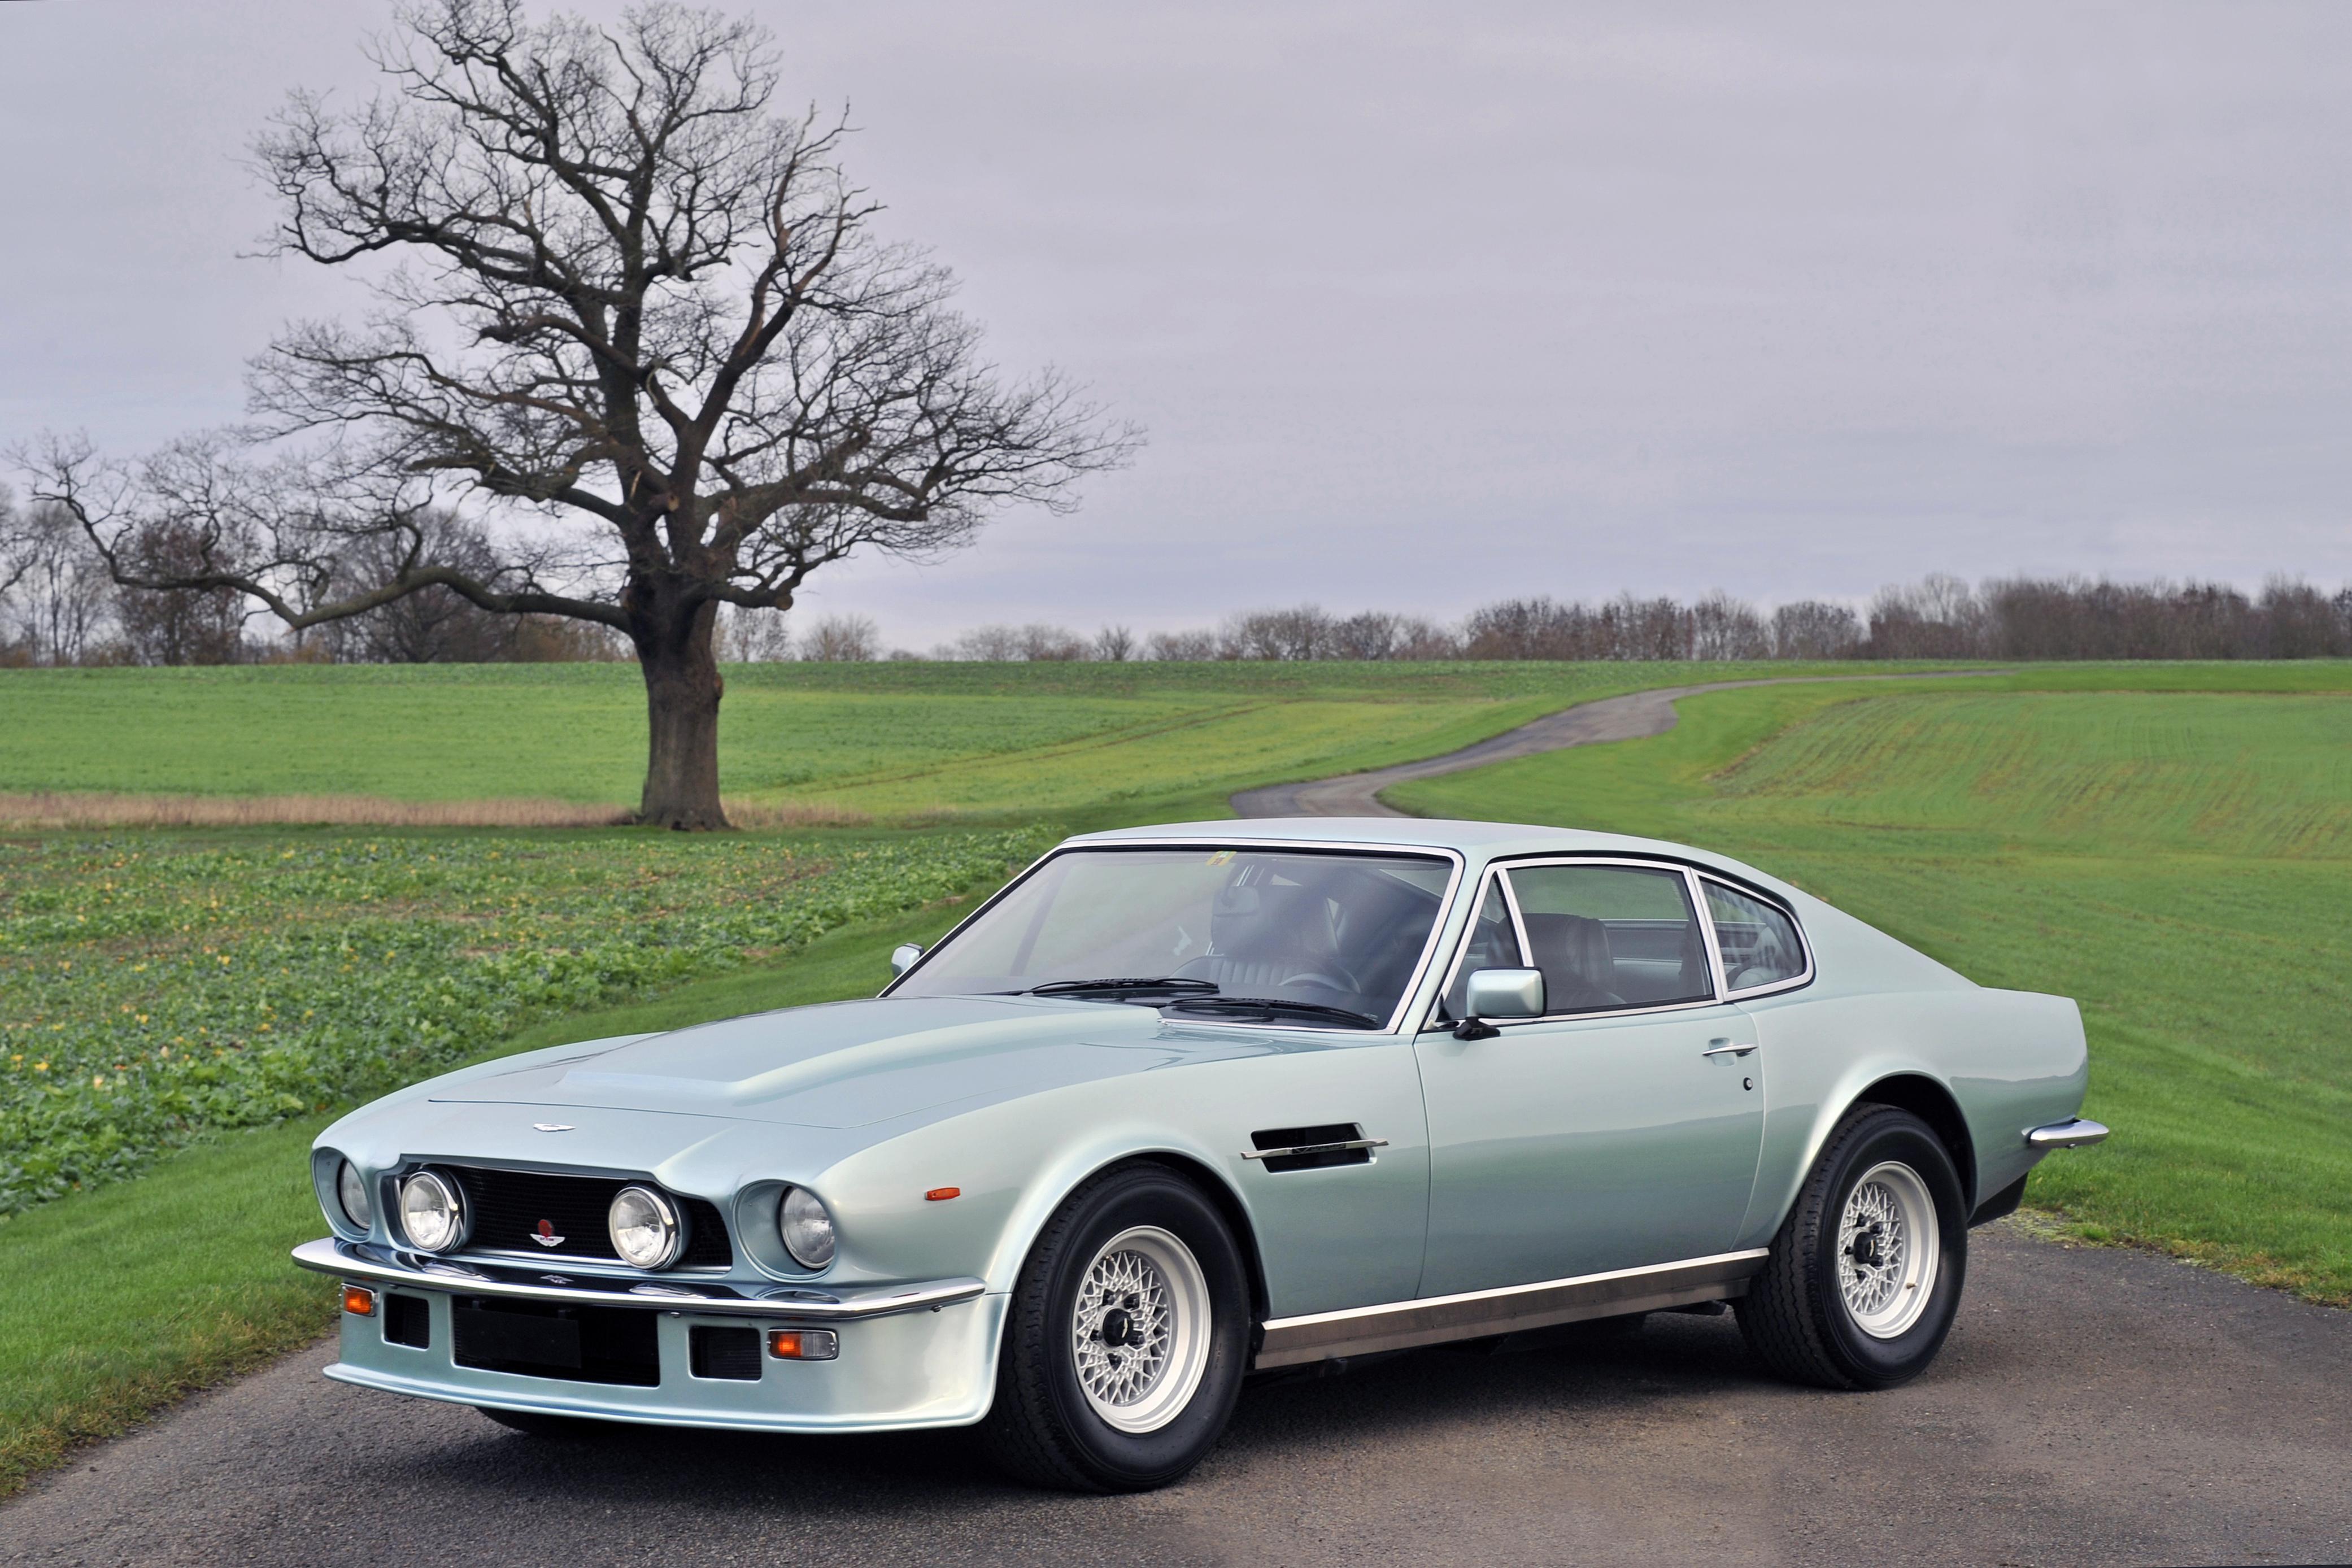 Cars – RS Williams Ltd – Aston Martin Heritage Specialist